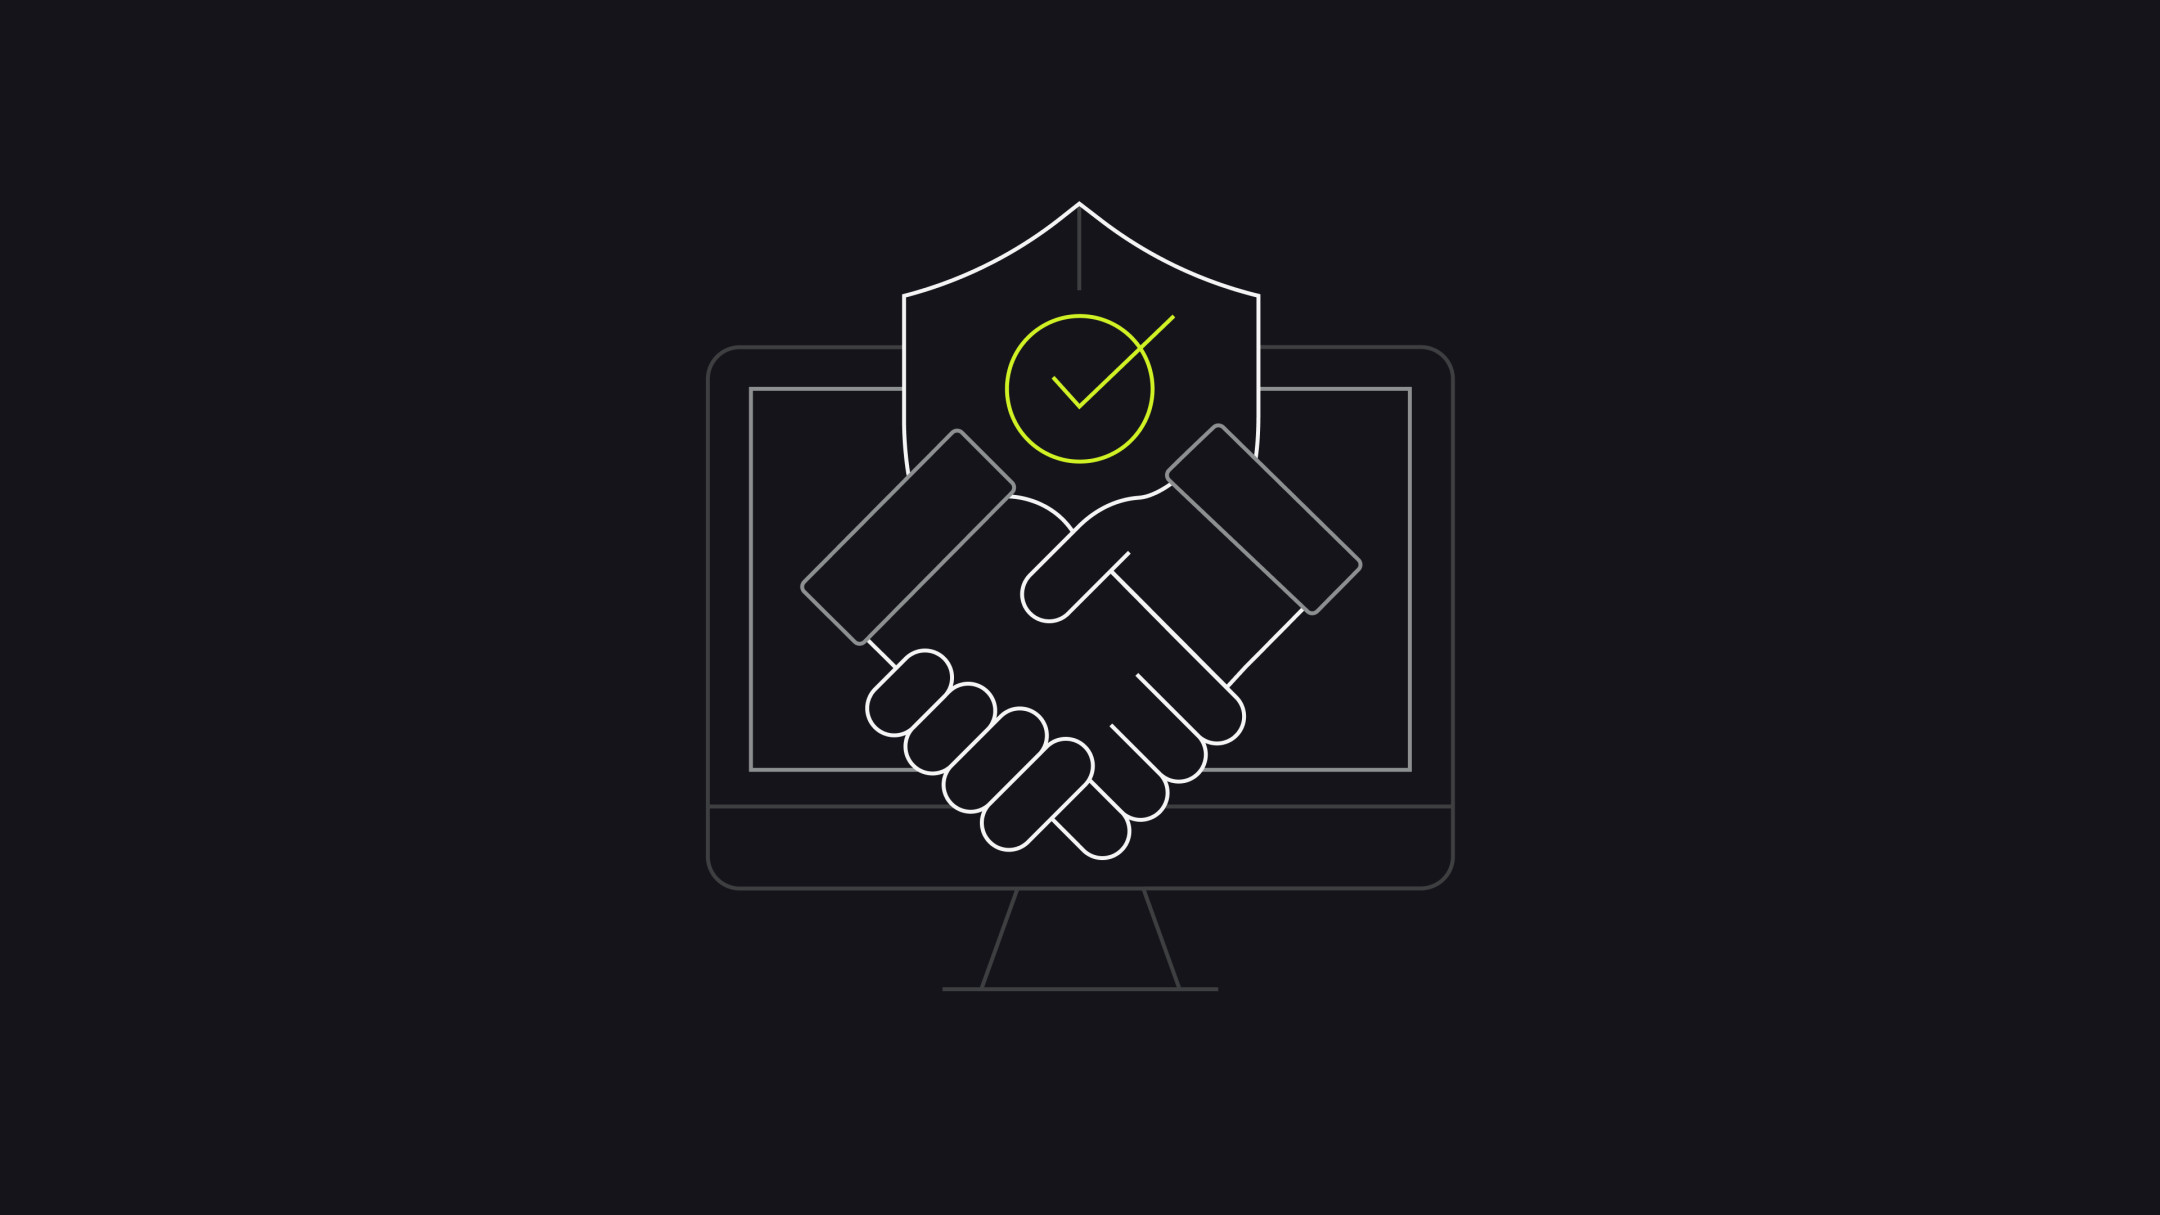 8 Ways to build online trust